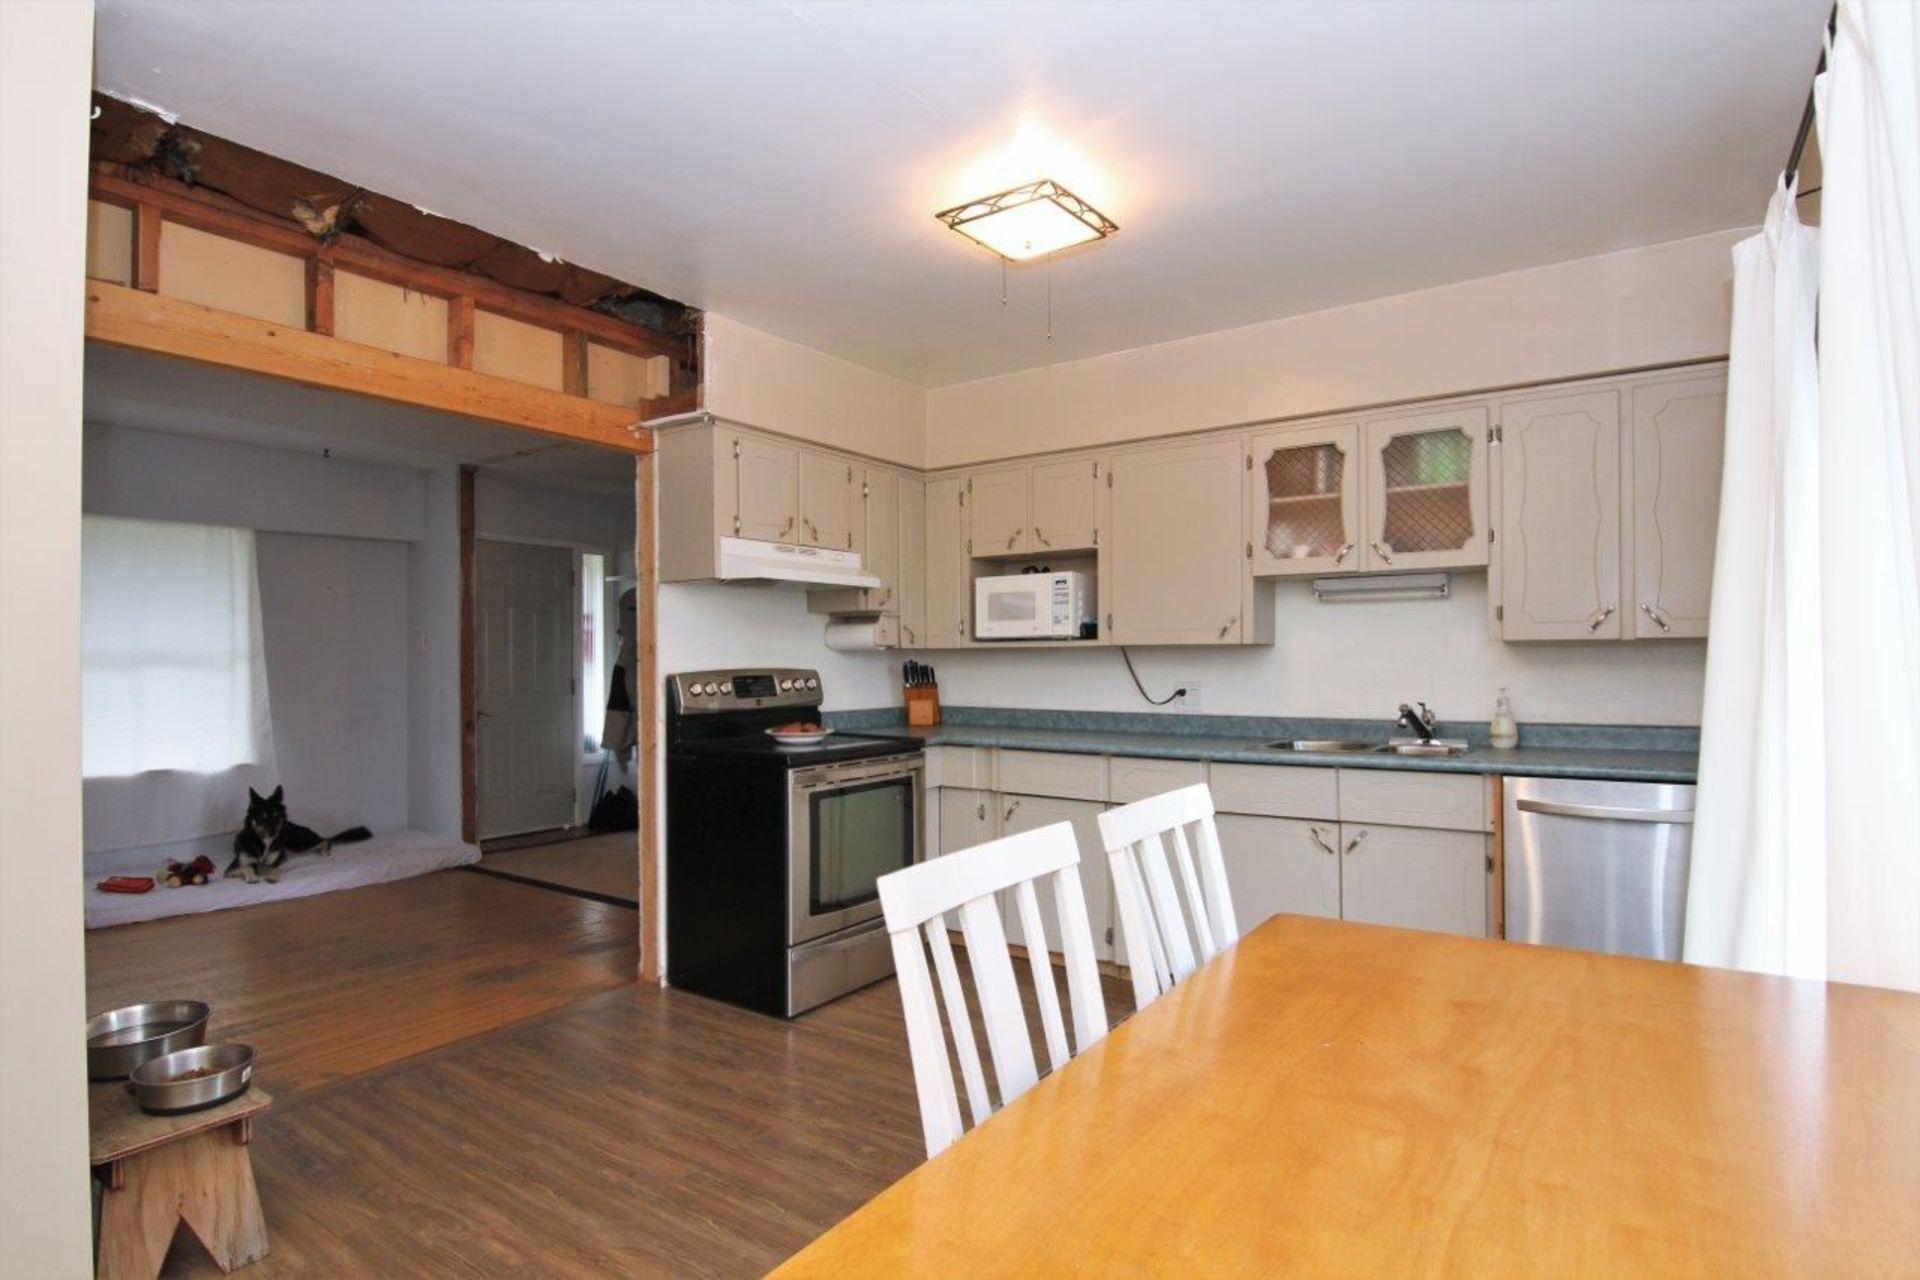 12351-203-street-west-central-maple-ridge-07 at 12351 203 Street, West Central, Maple Ridge